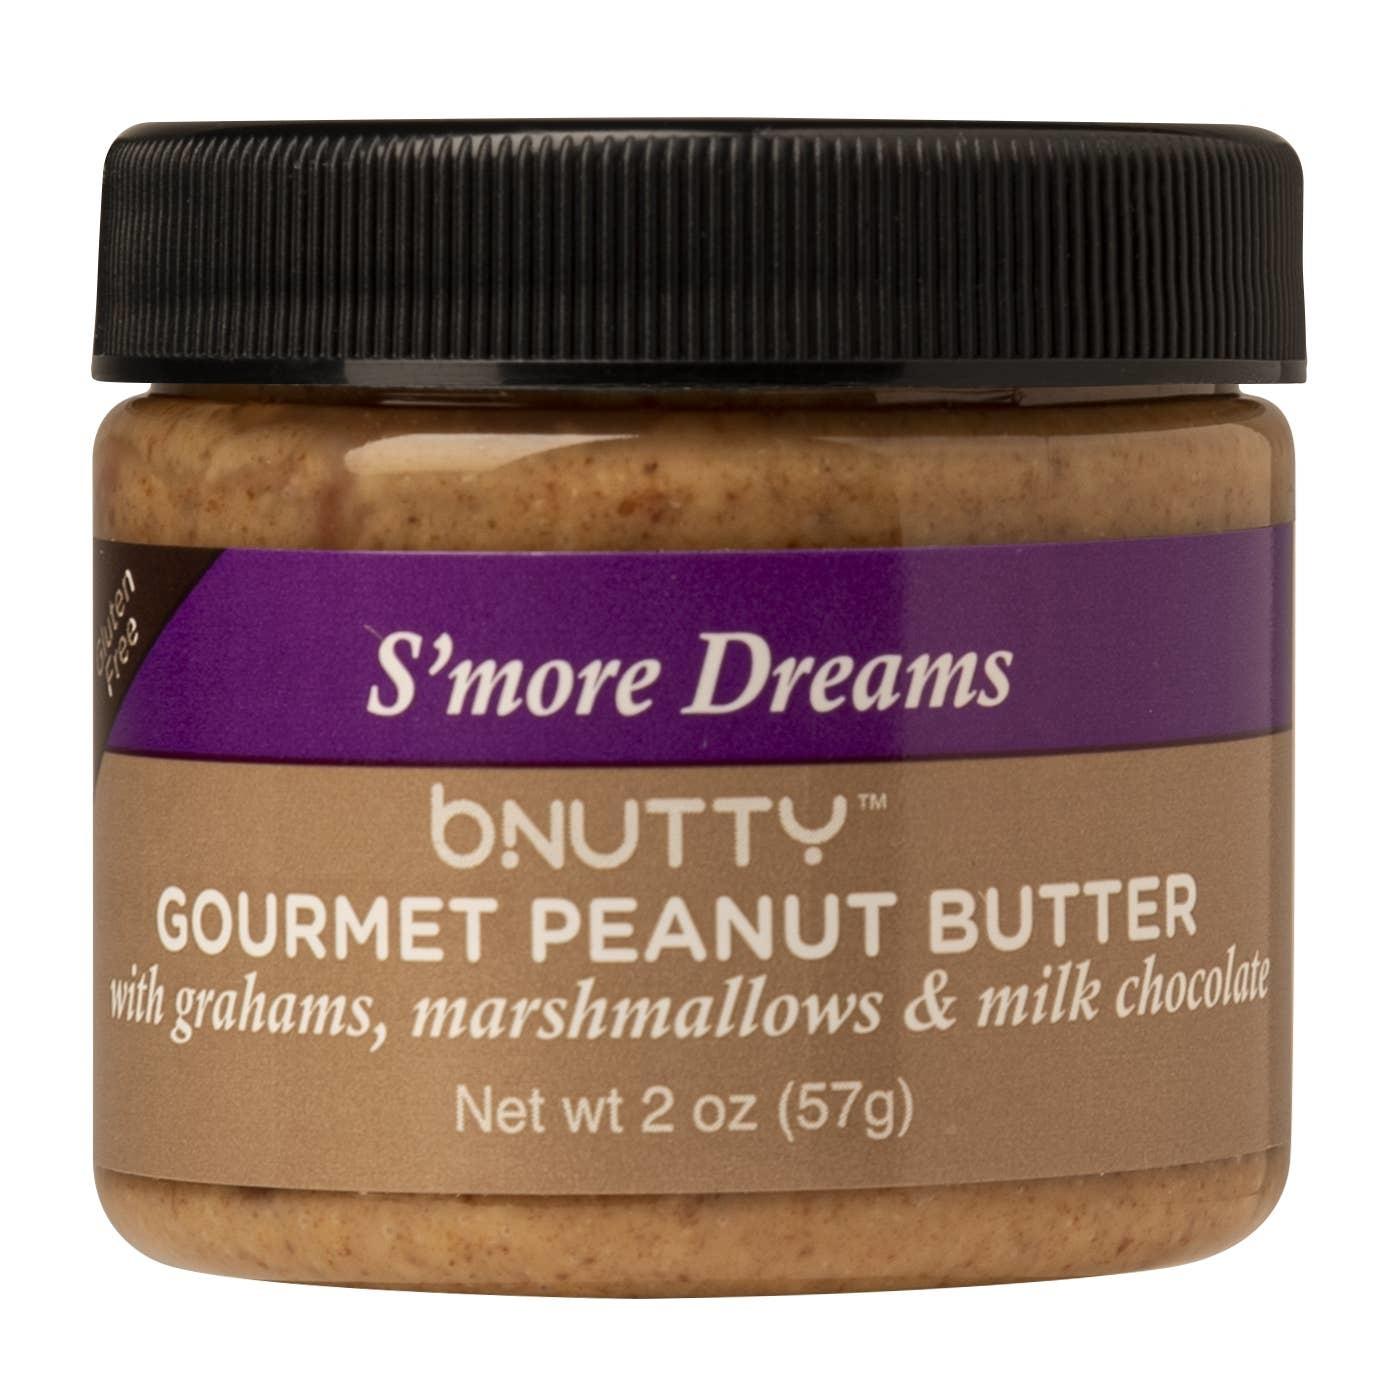 Fleurish Home 2 oz Mini S'more Dreams Gourmet Peanut Butter